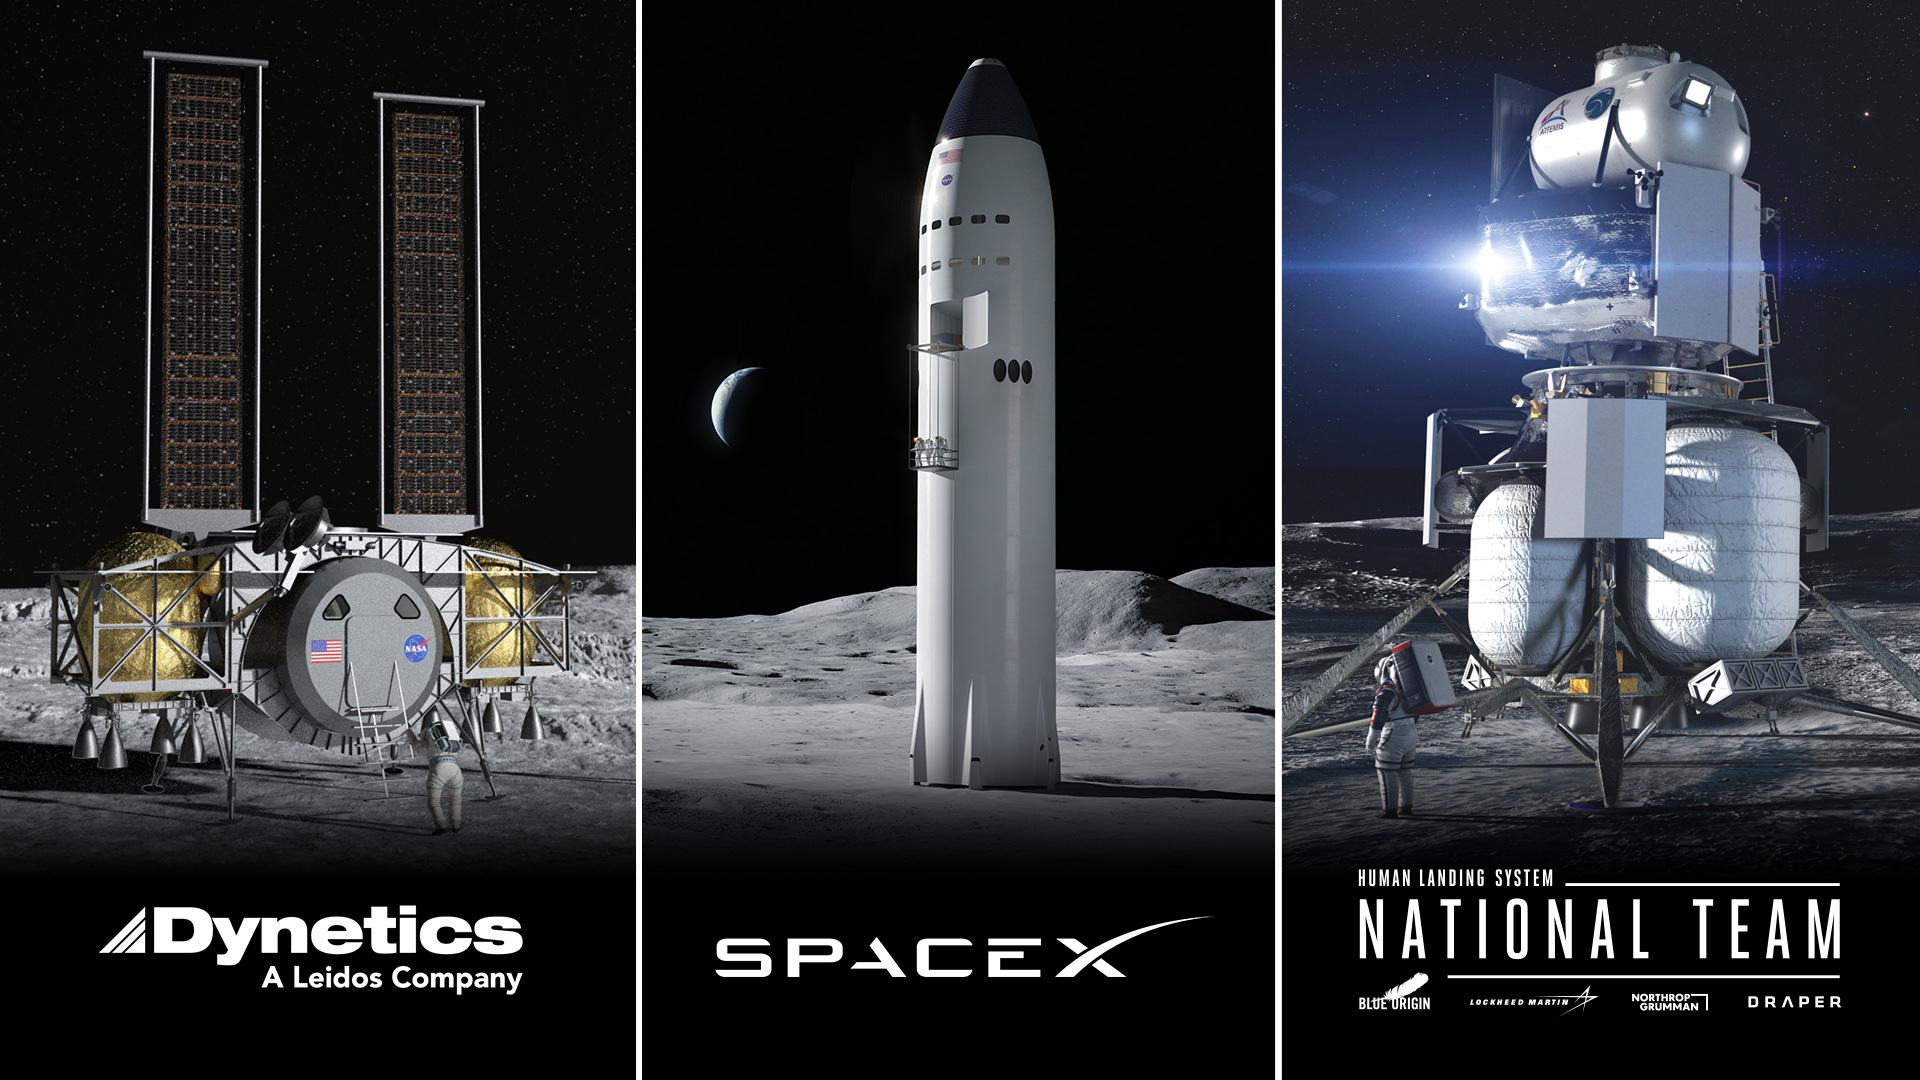 Посадочный модуль Starship Moon от SpaceX прошел проверку НАСА вместе с Blue Origin, Dynetics